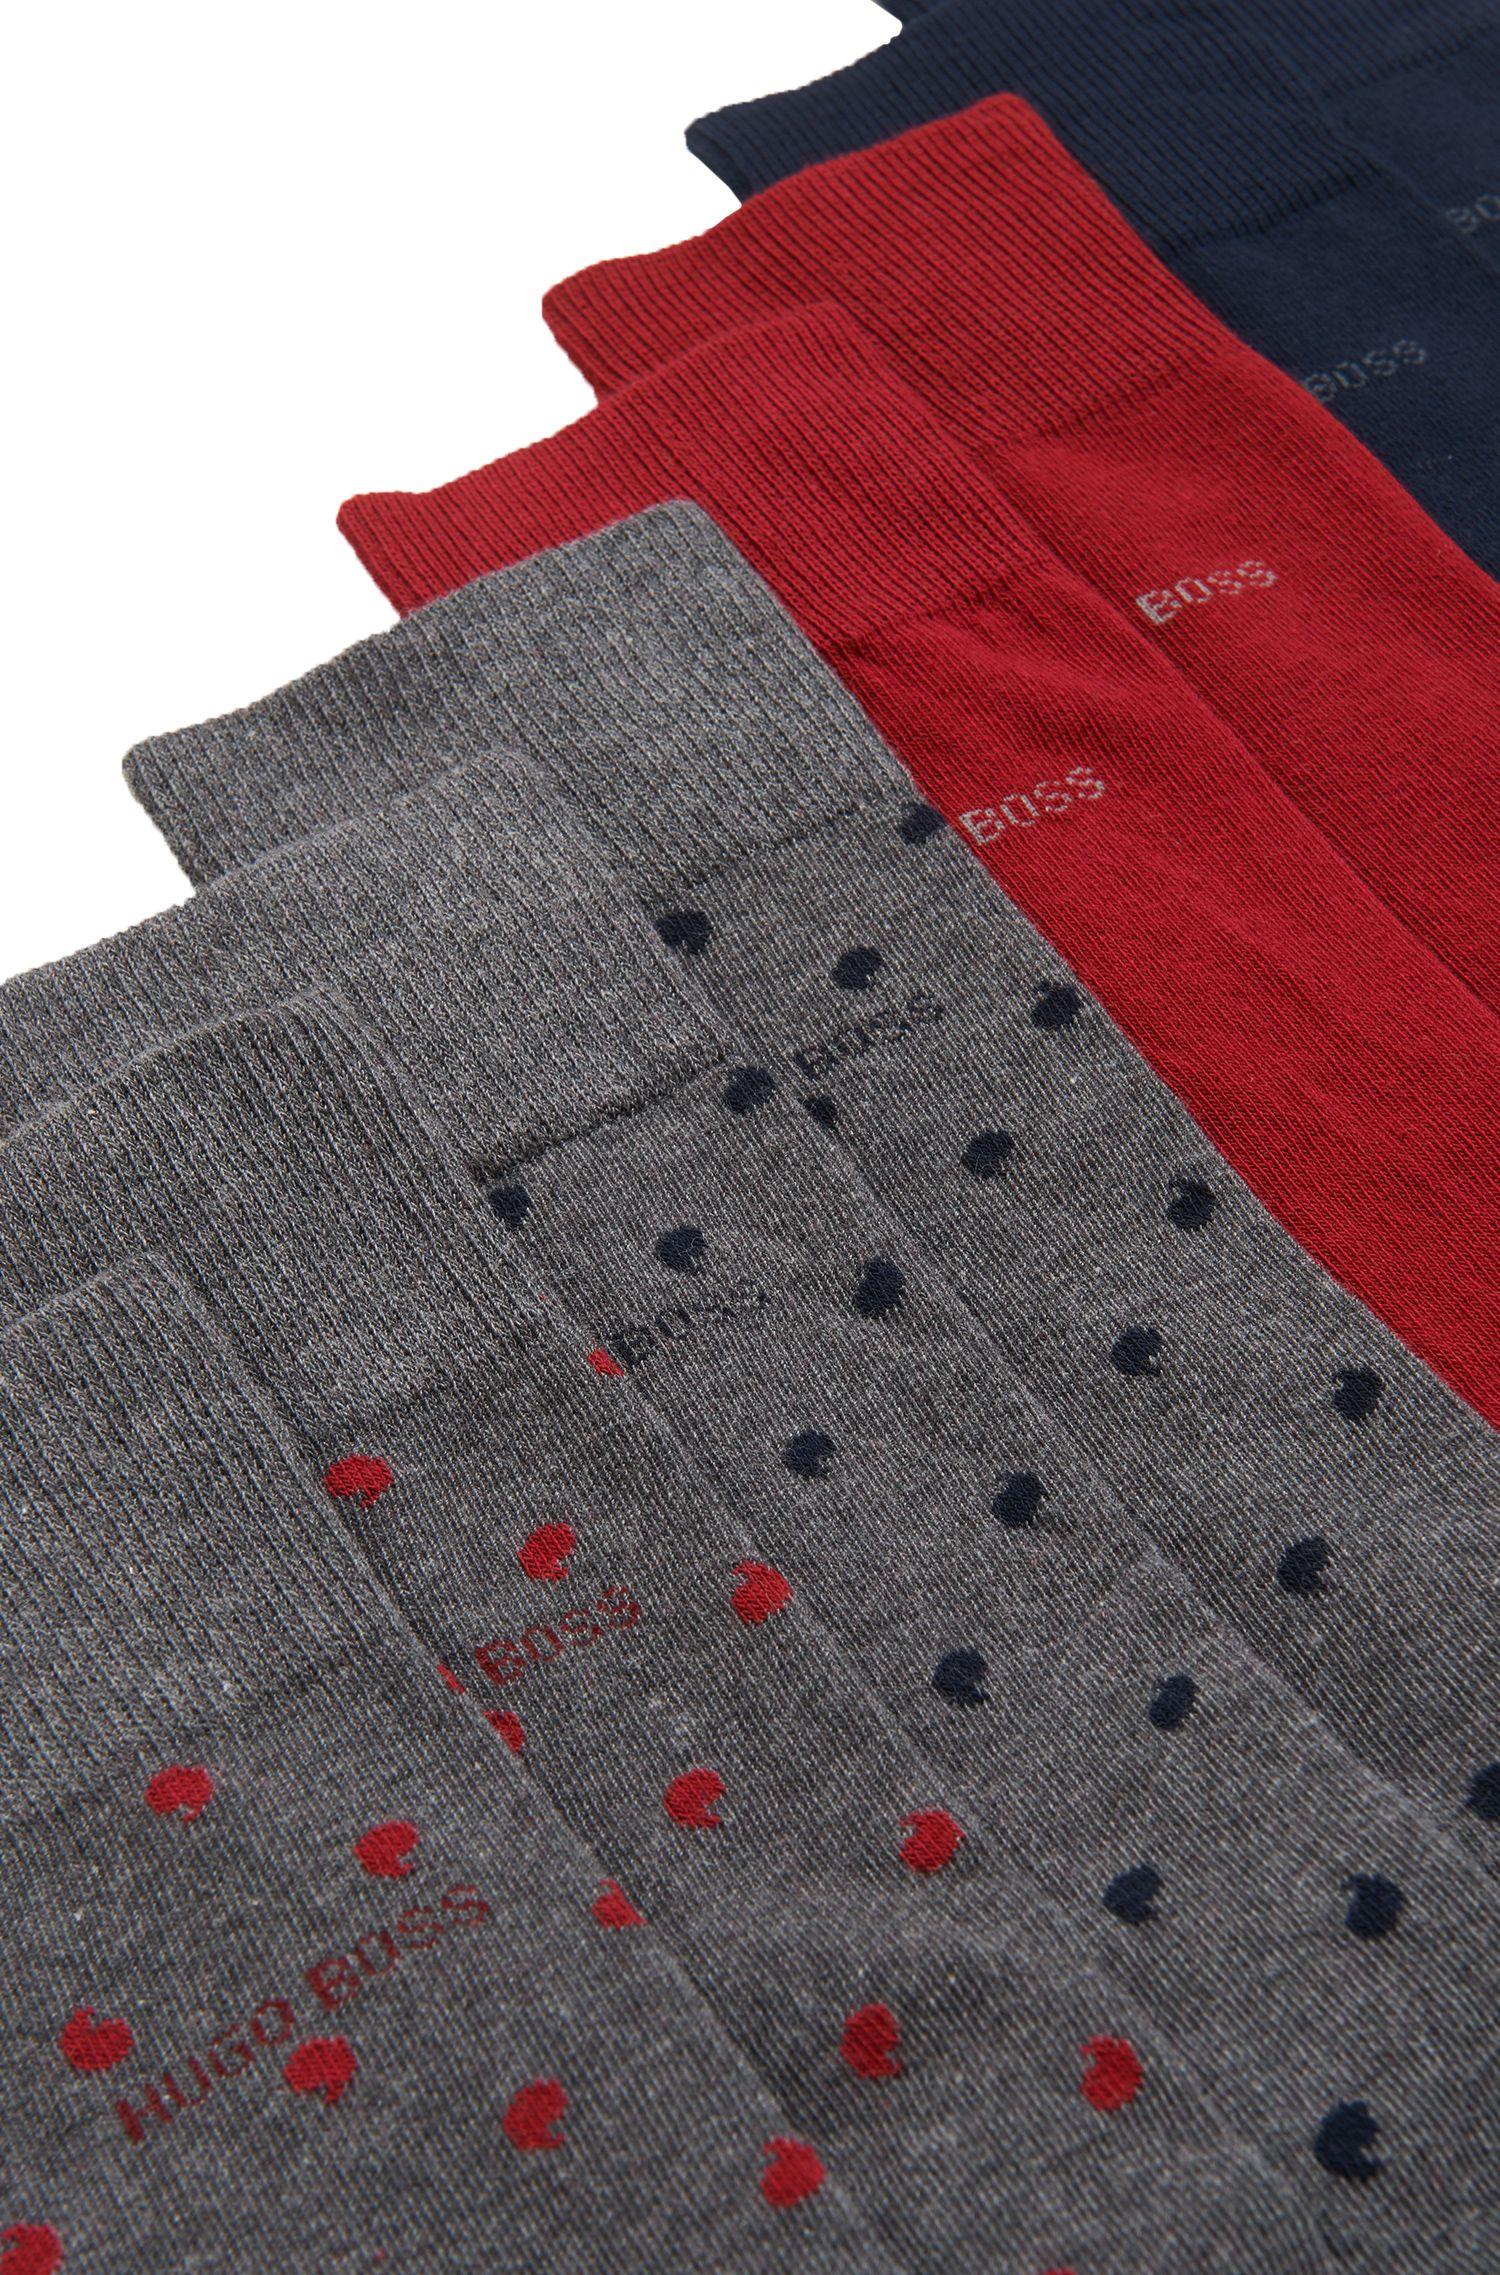 Stretch Cotton Socks Gift Set | 4P RS Gift Set US CC